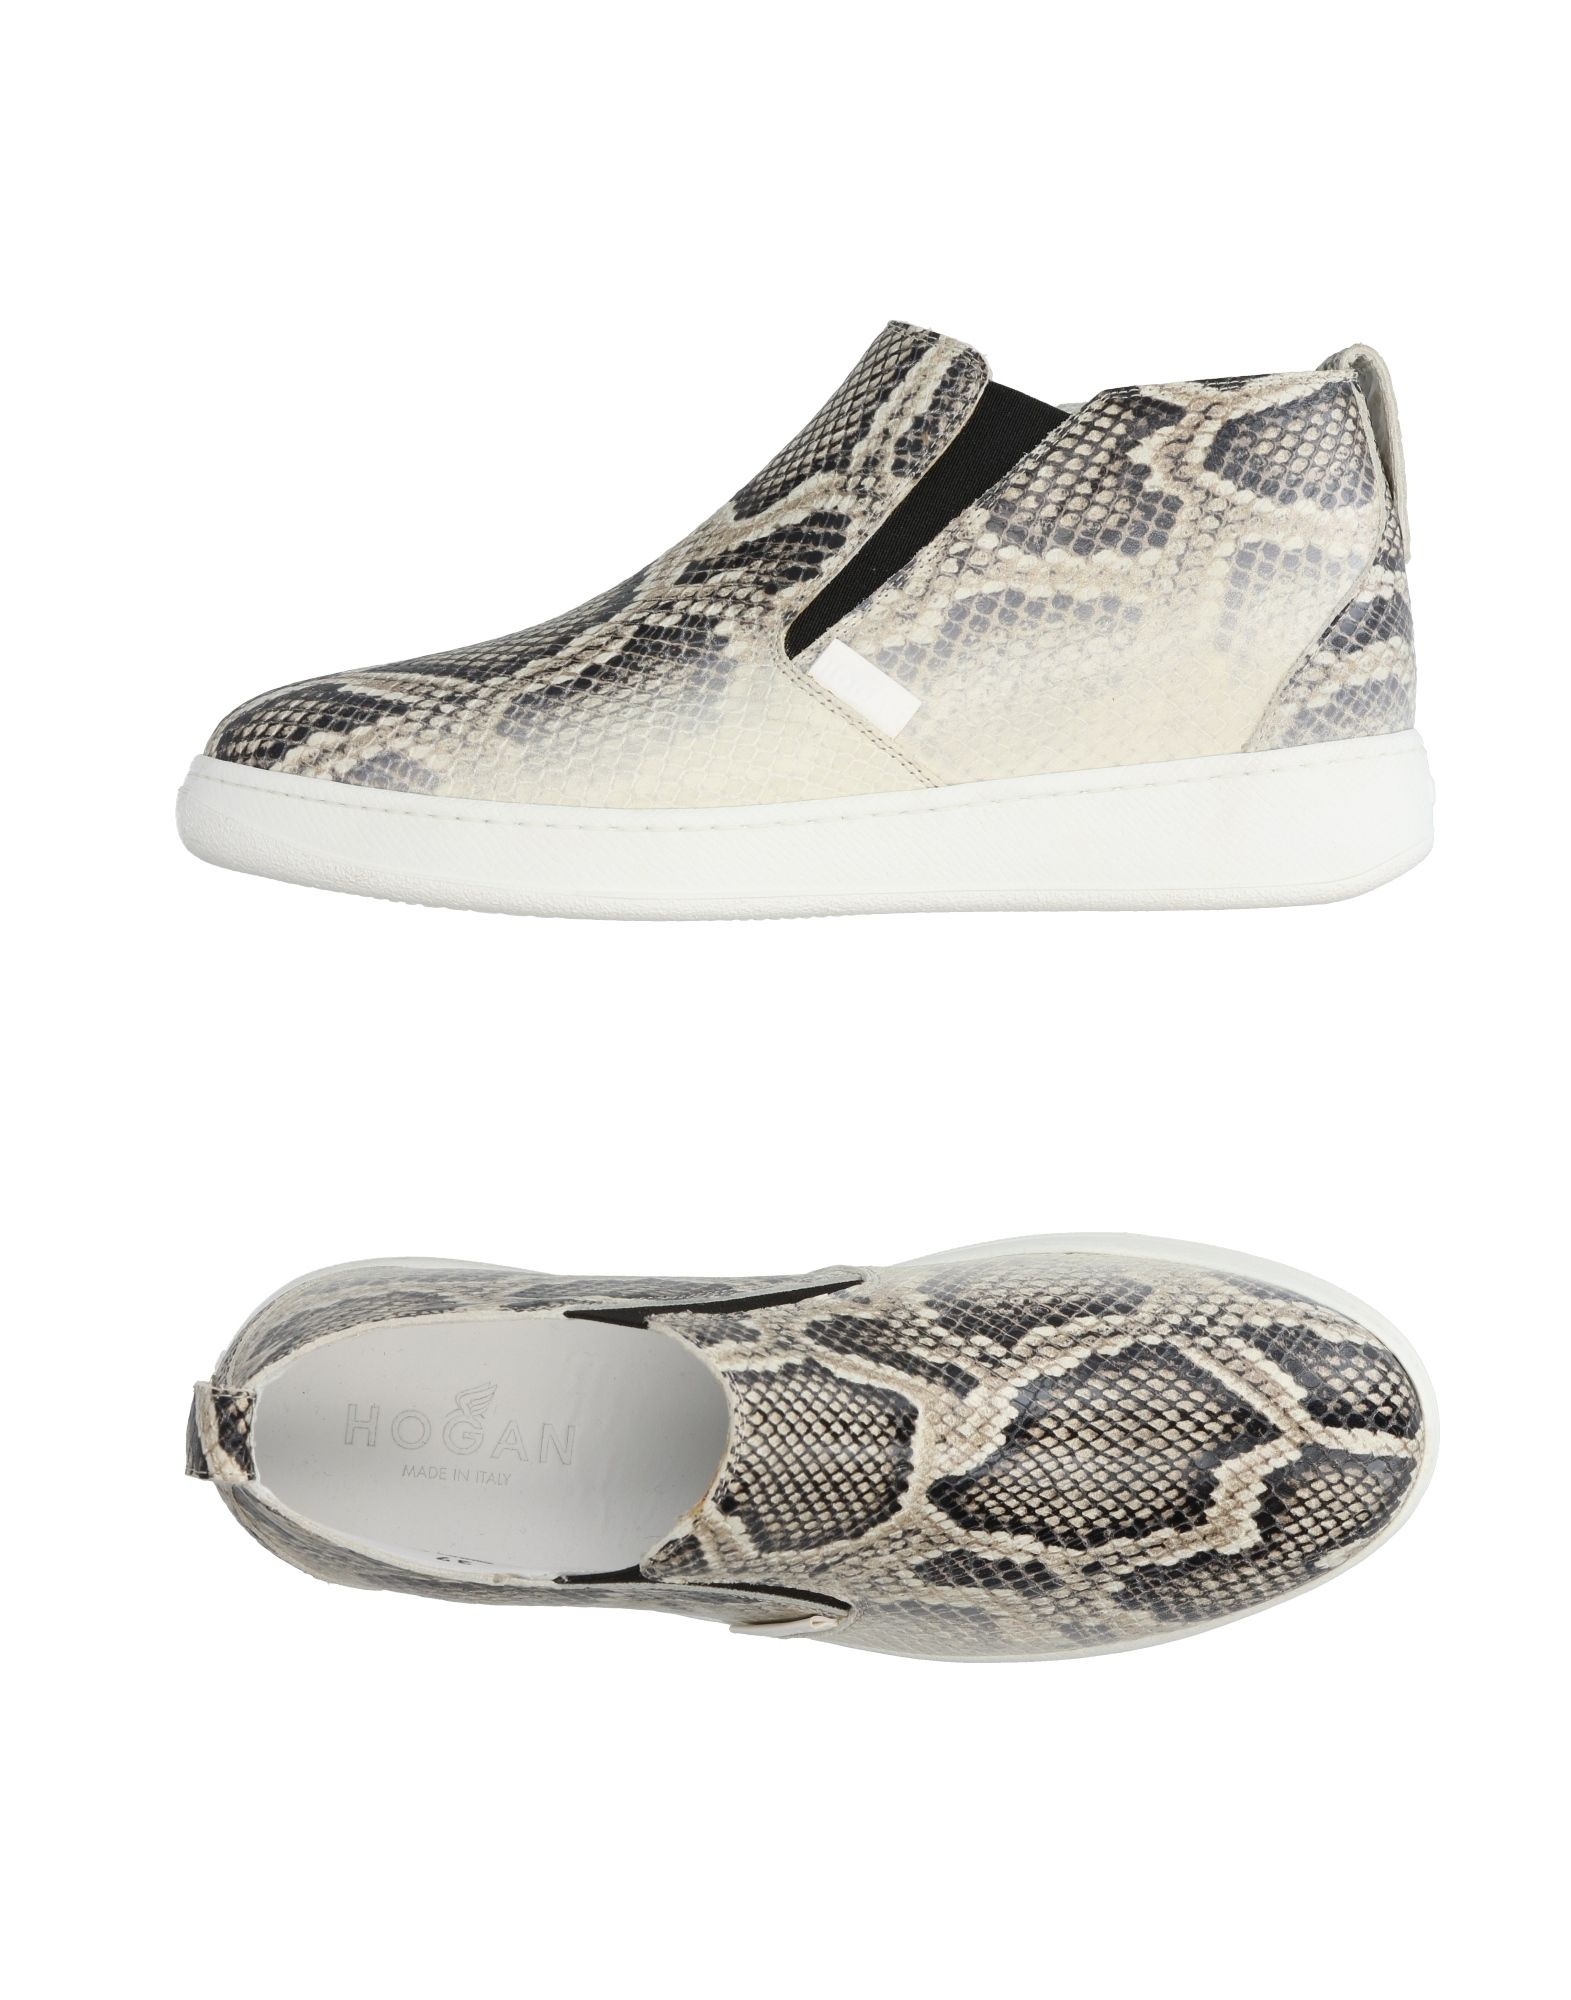 Hogan Sneakers Damen Damen Sneakers  11299840JK Heiße Schuhe 7d9d7b